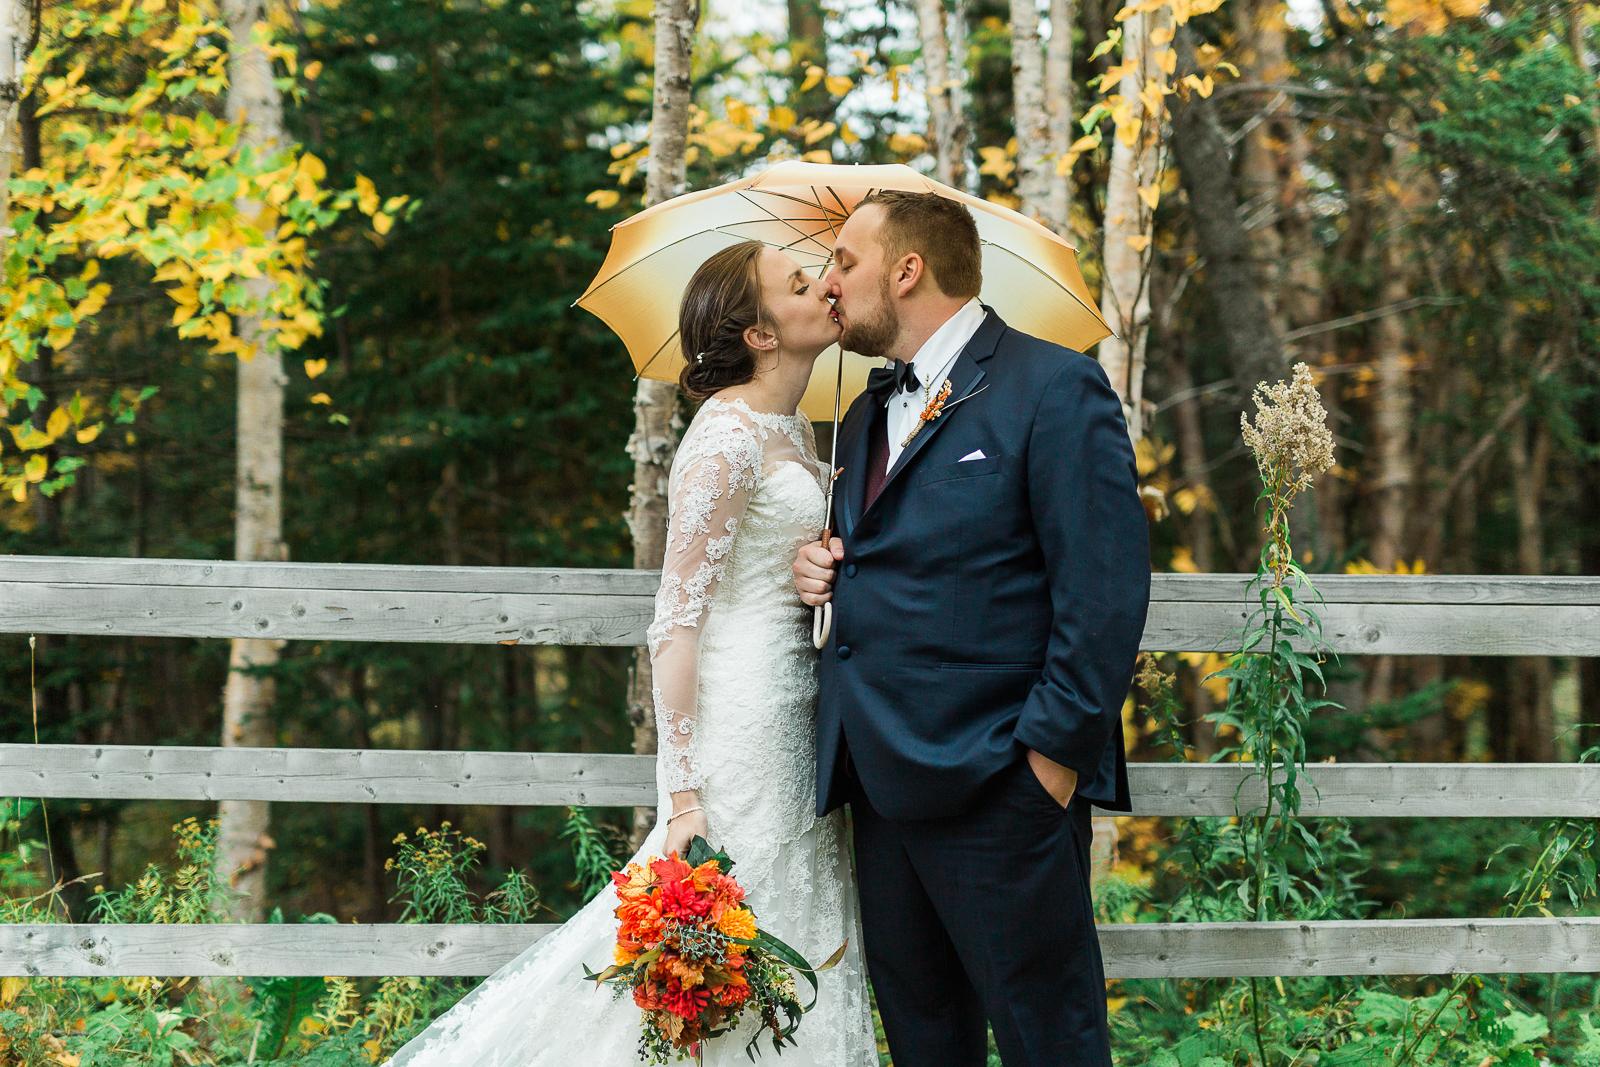 gander-wedding-photographer-105.jpg